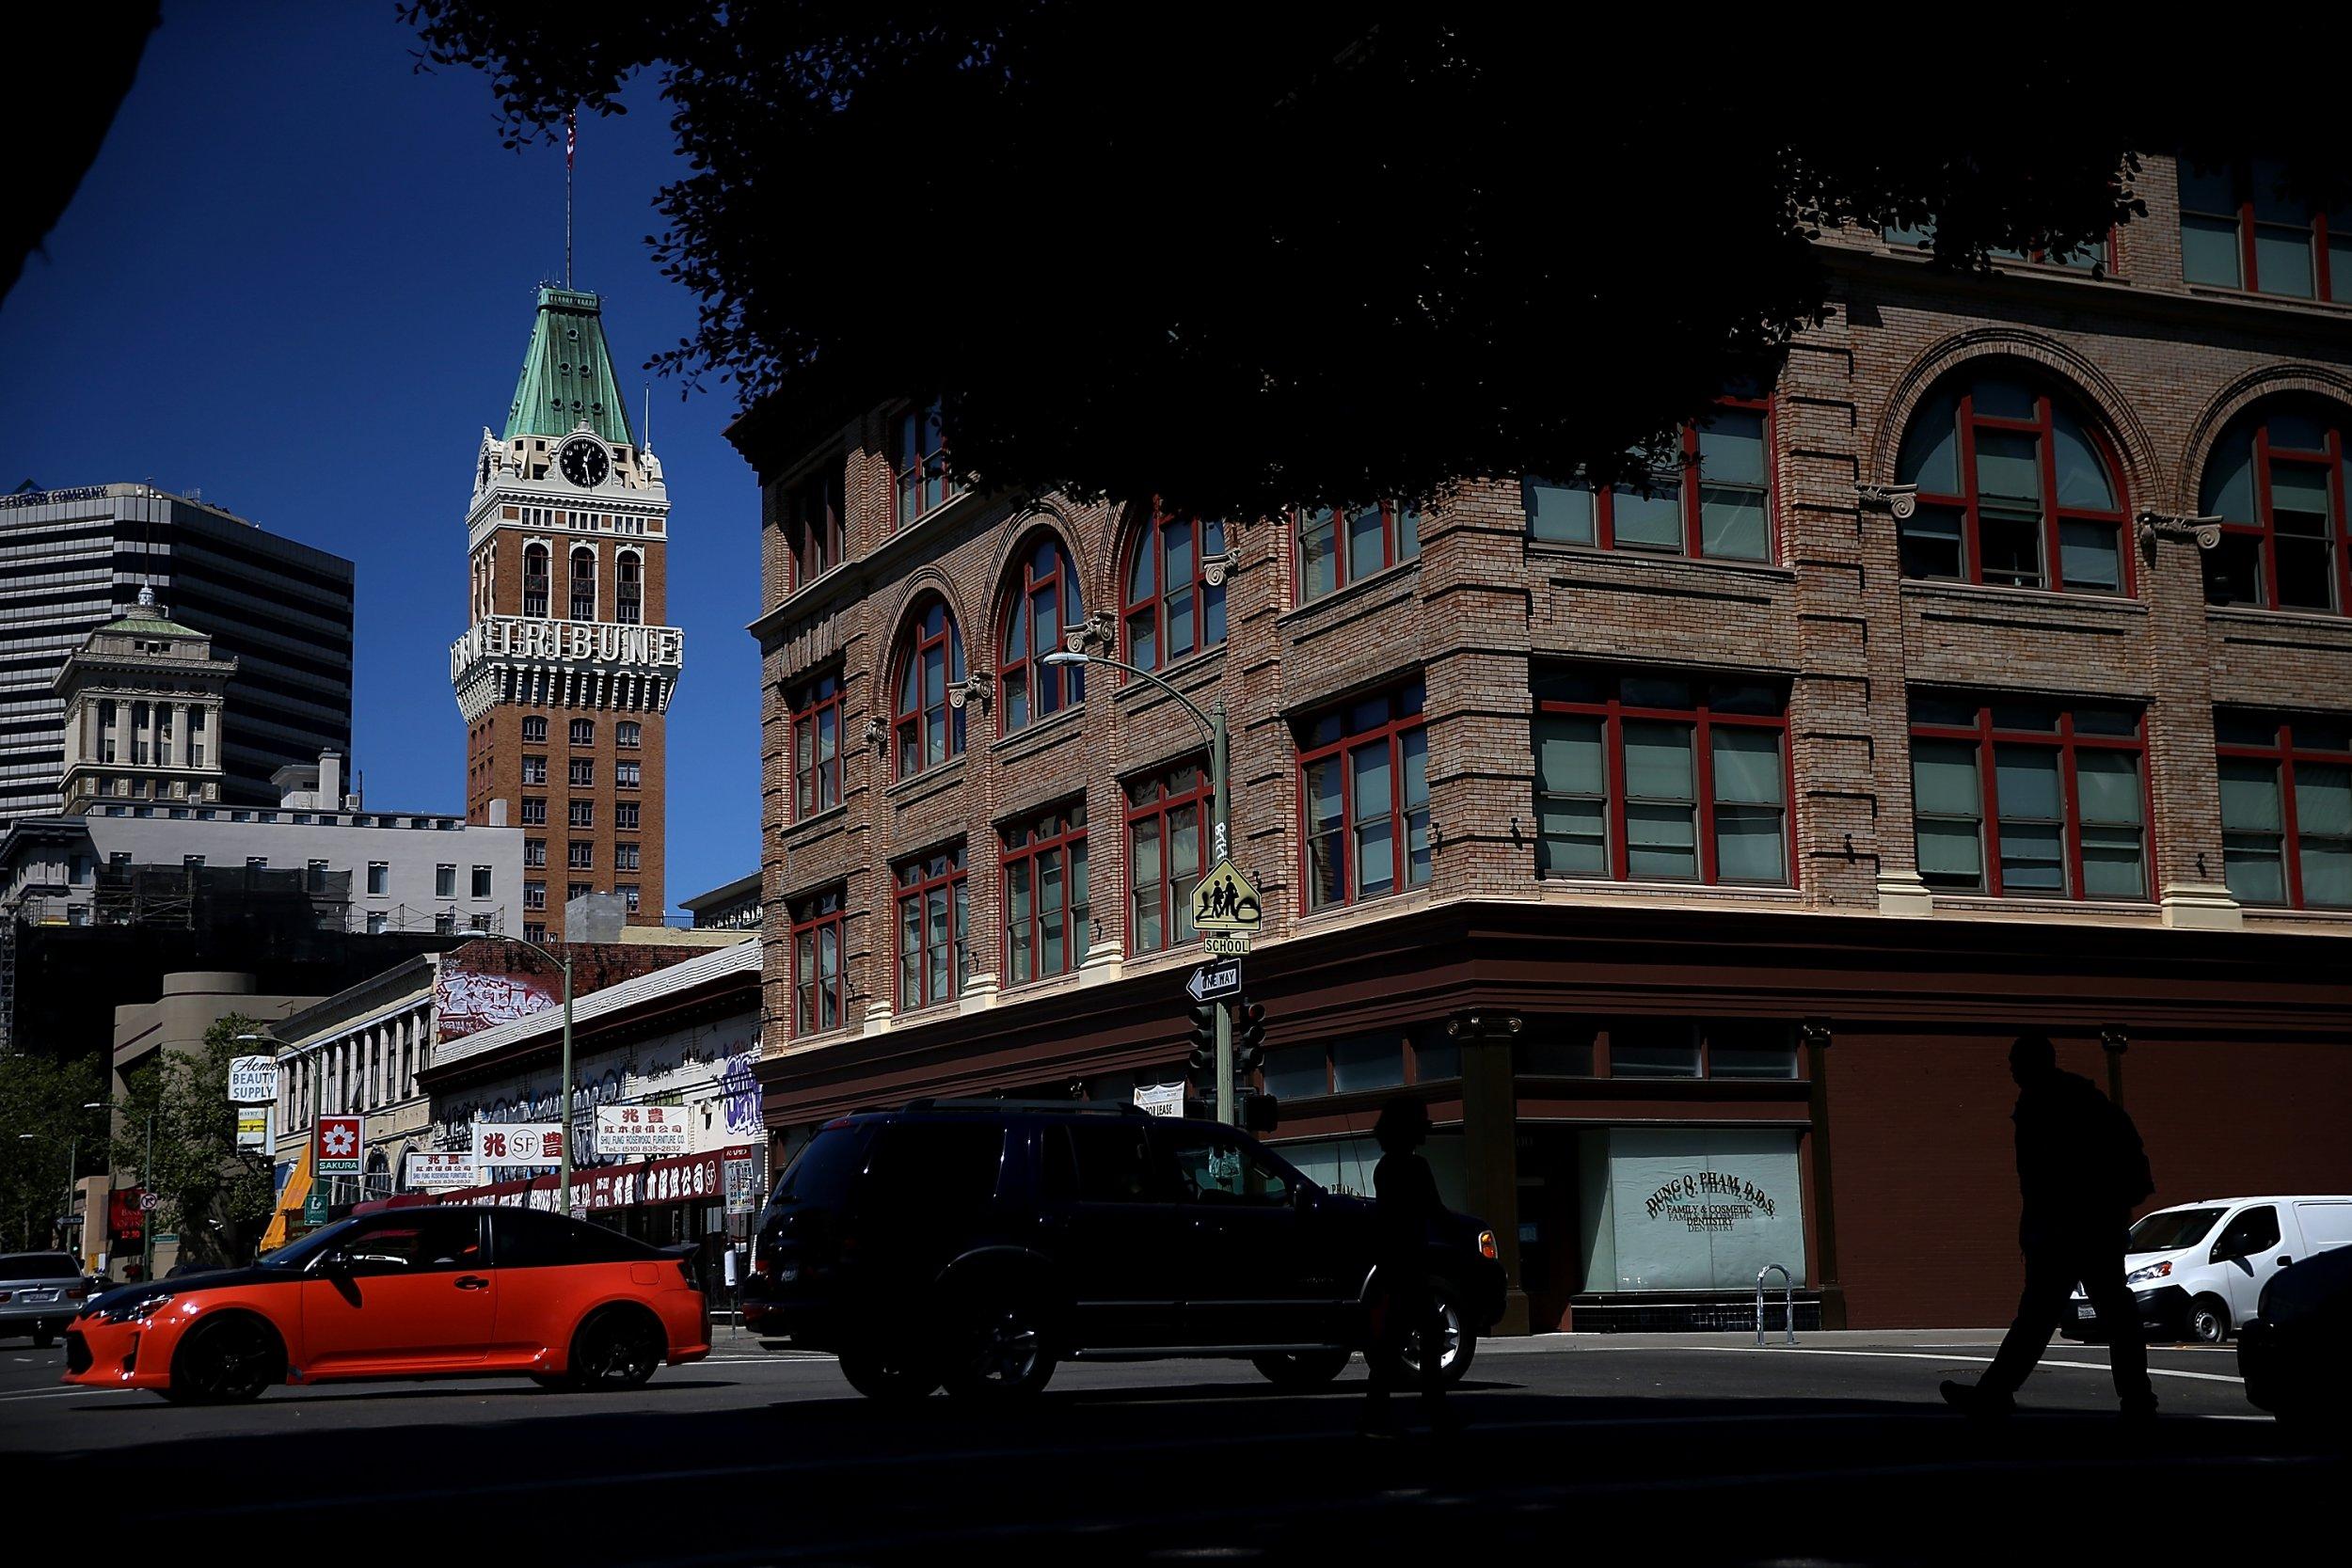 Oakland_Tribune